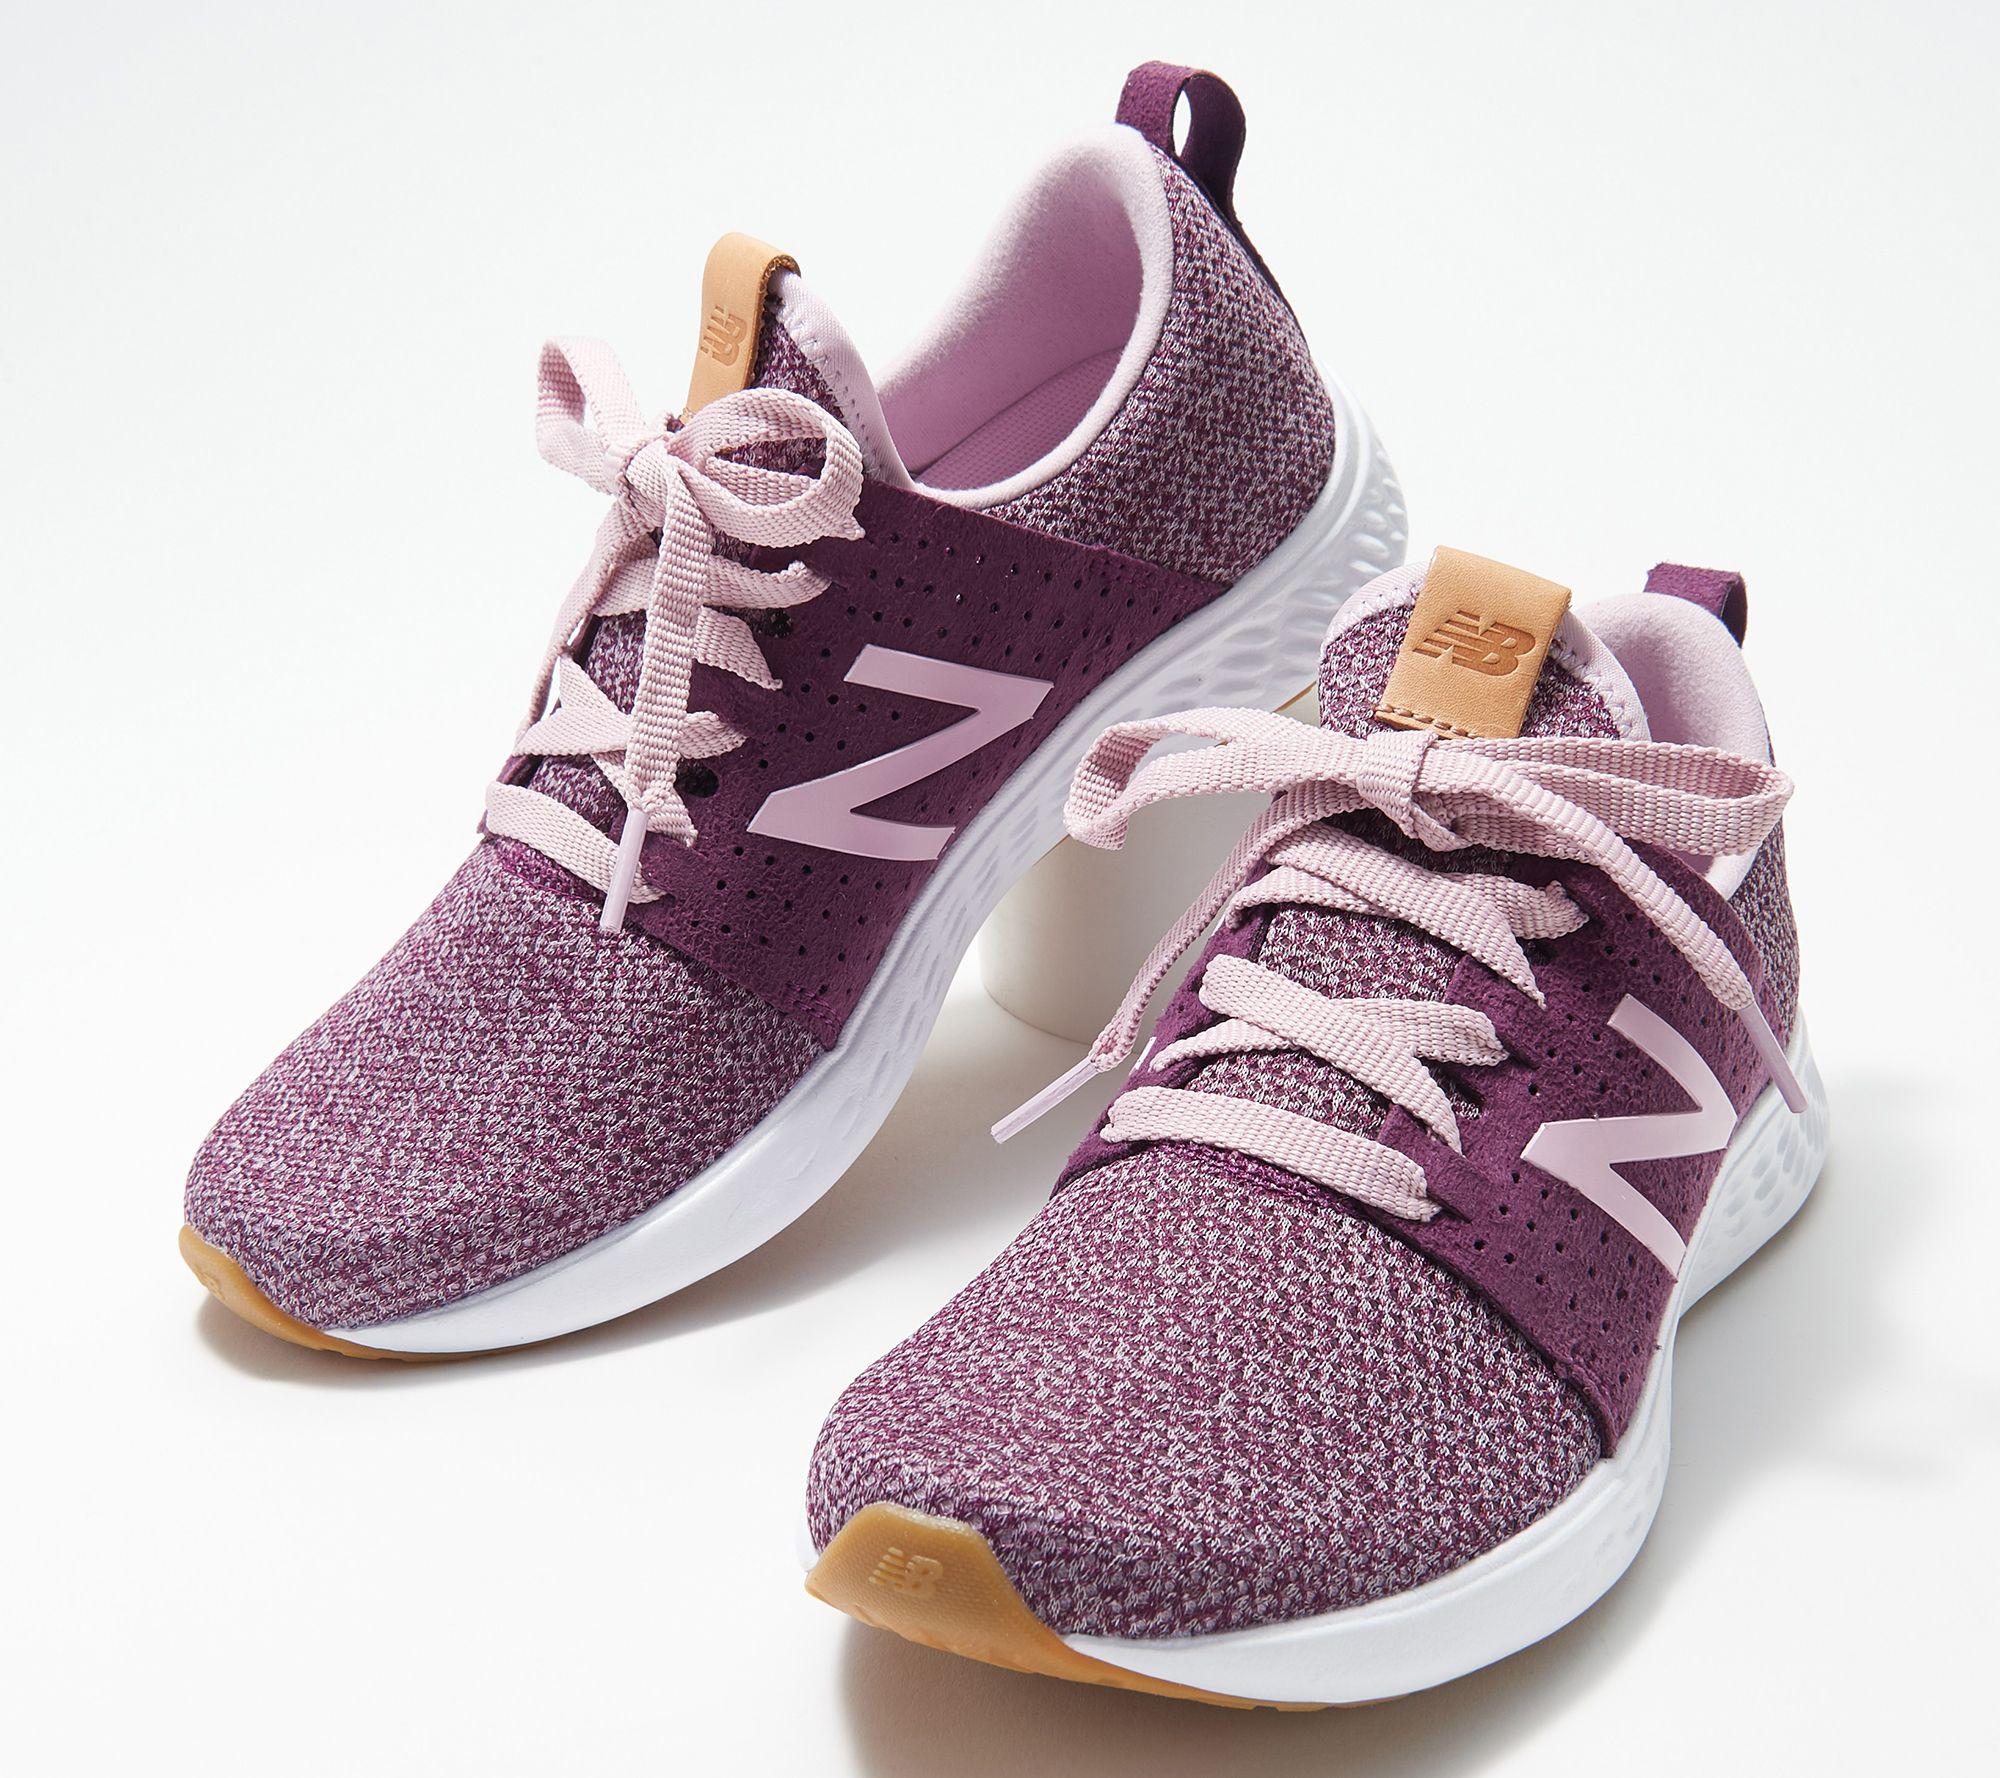 new balance shoe laces